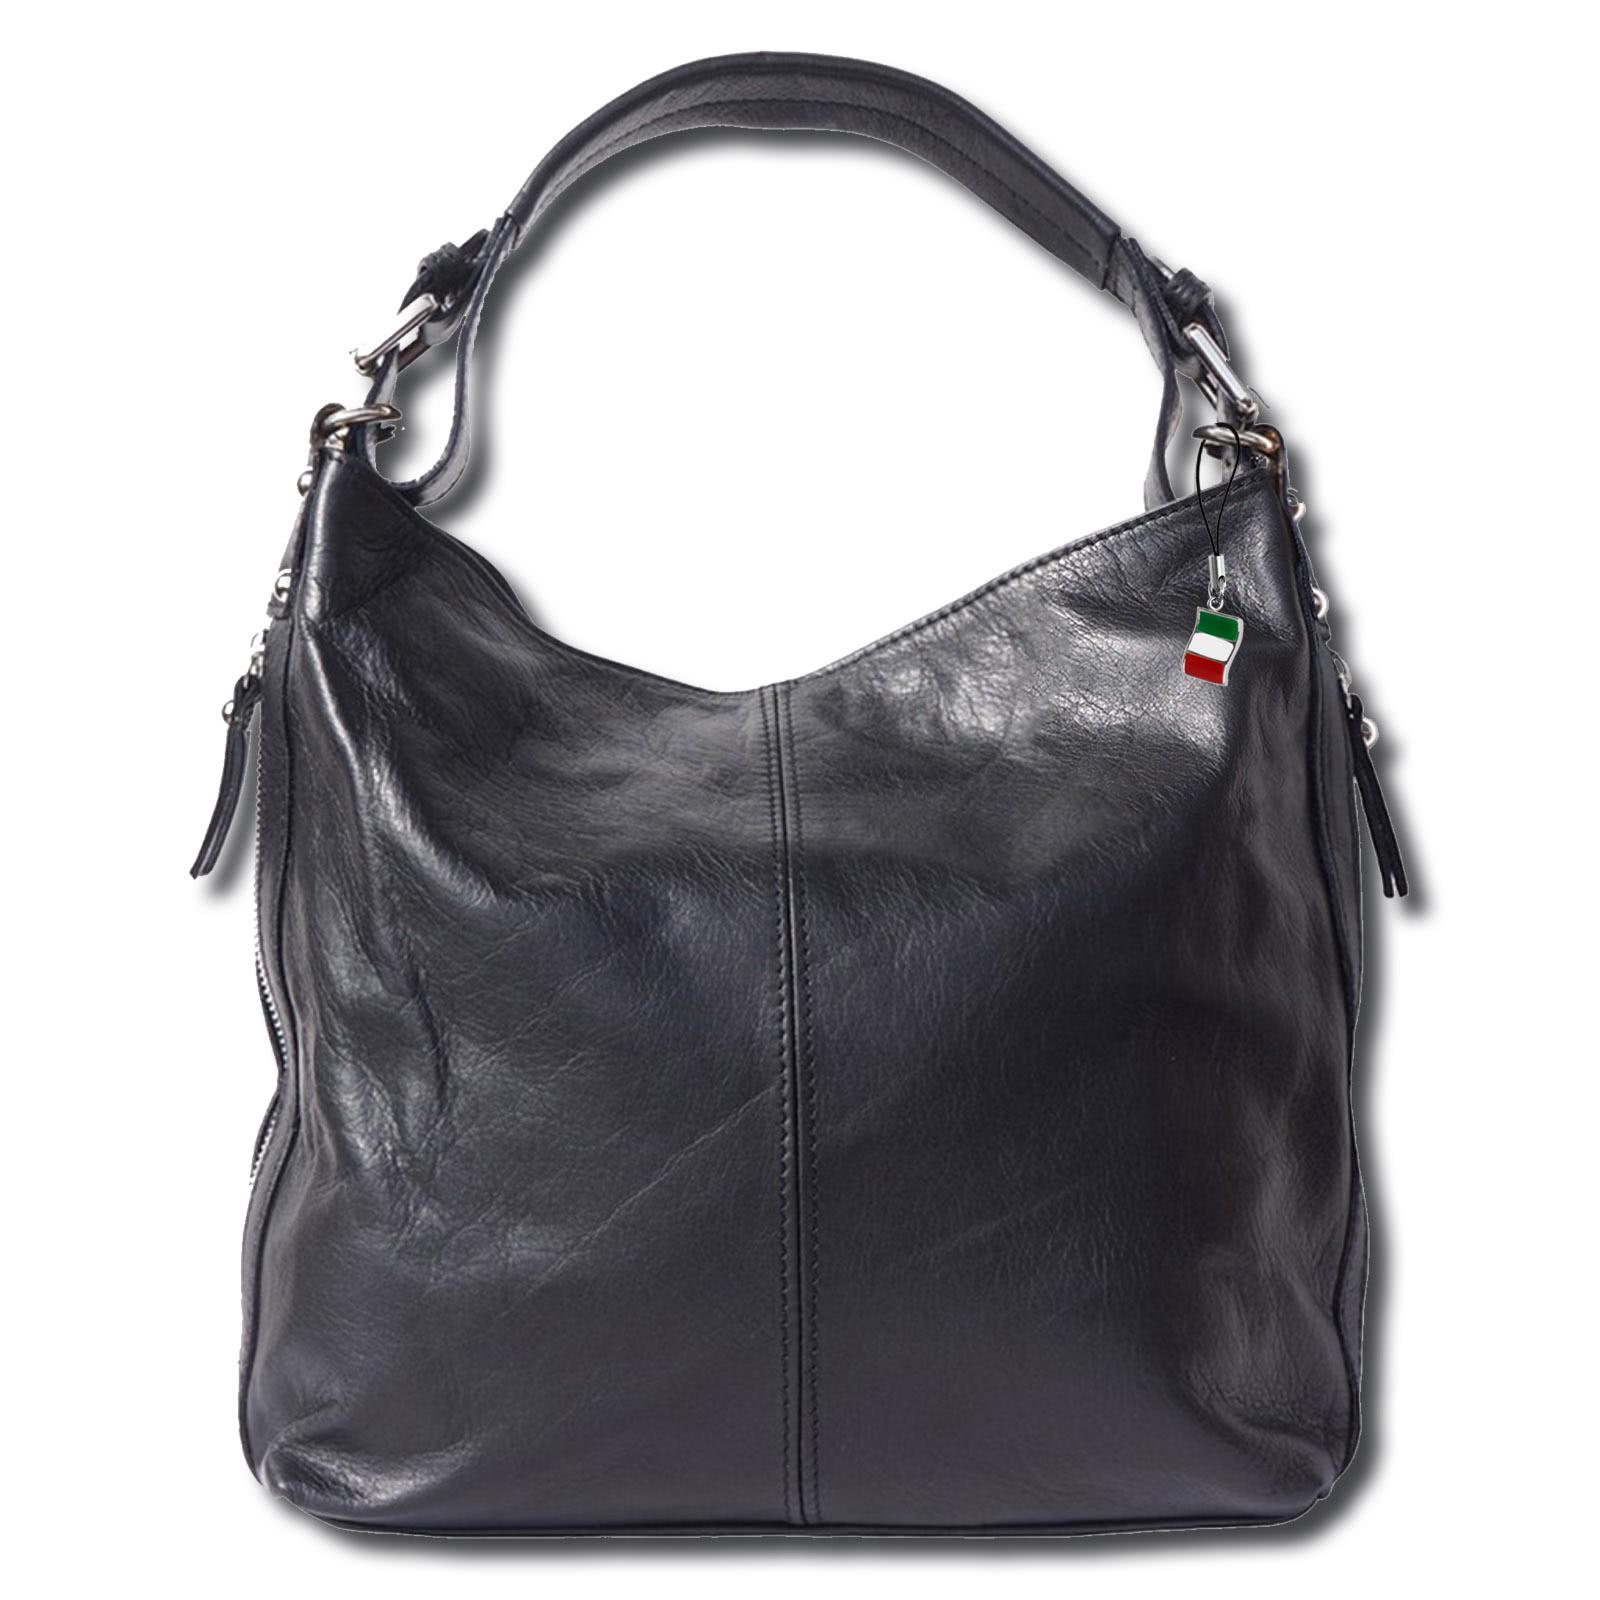 beuteltasche handtasche damen handtasche leder schwarz. Black Bedroom Furniture Sets. Home Design Ideas